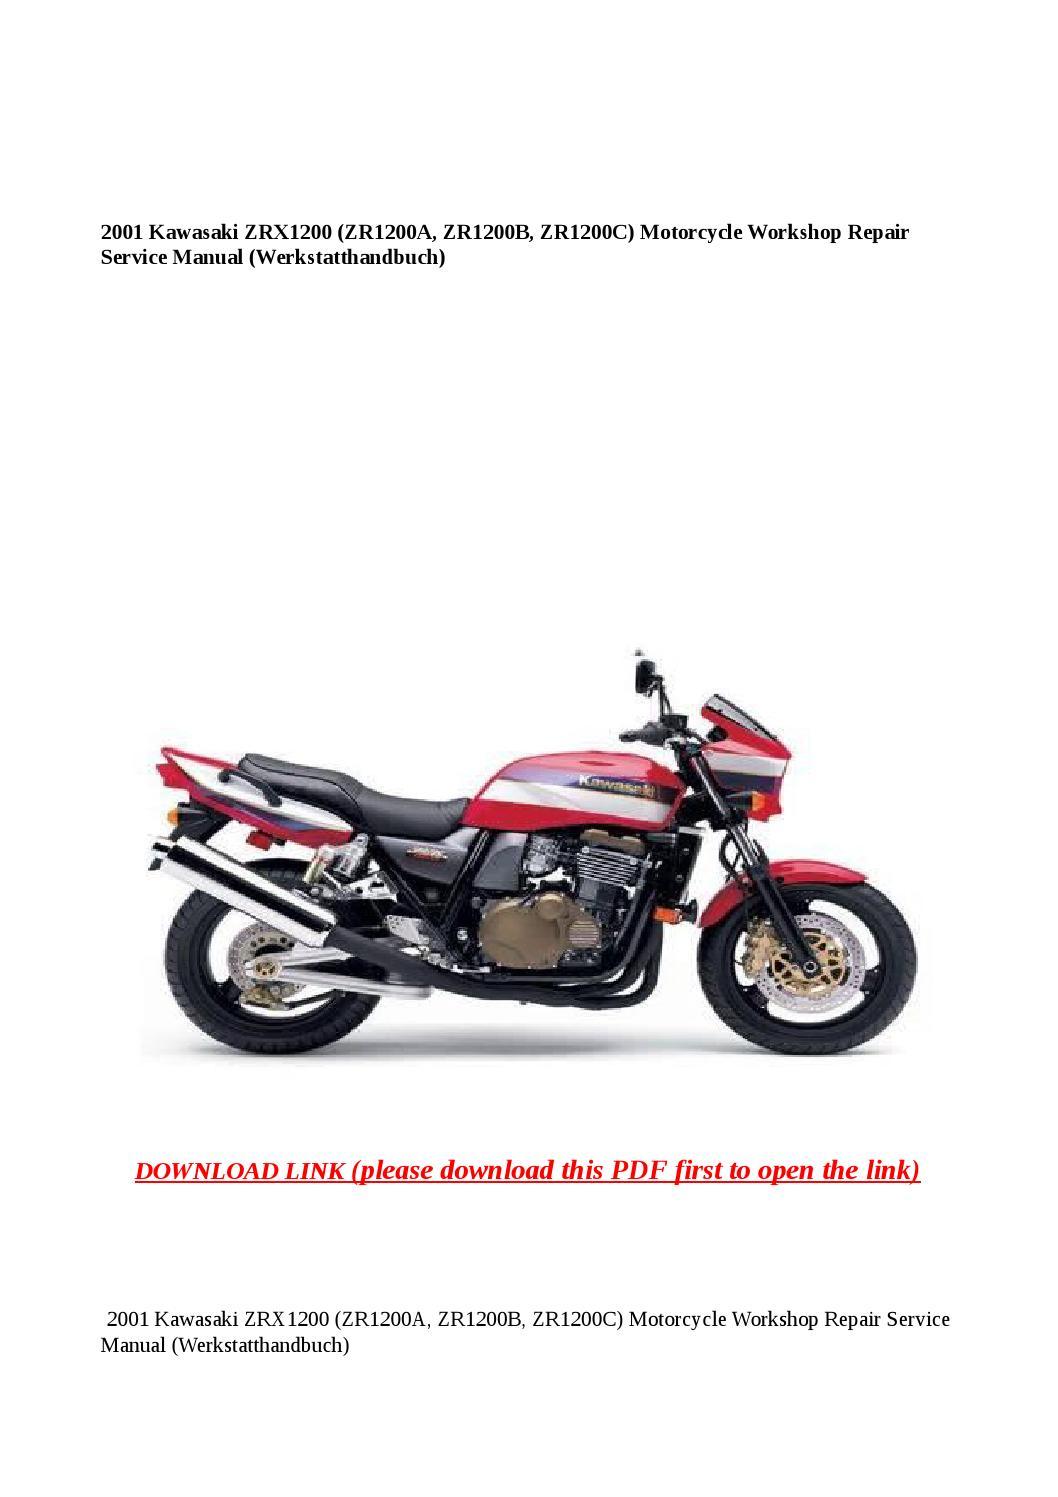 2001 kawasaki zrx1200 (zr1200a, zr1200b, zr1200c) motorcycle workshop  repair service manual (werksta by Anna Tang - issuu